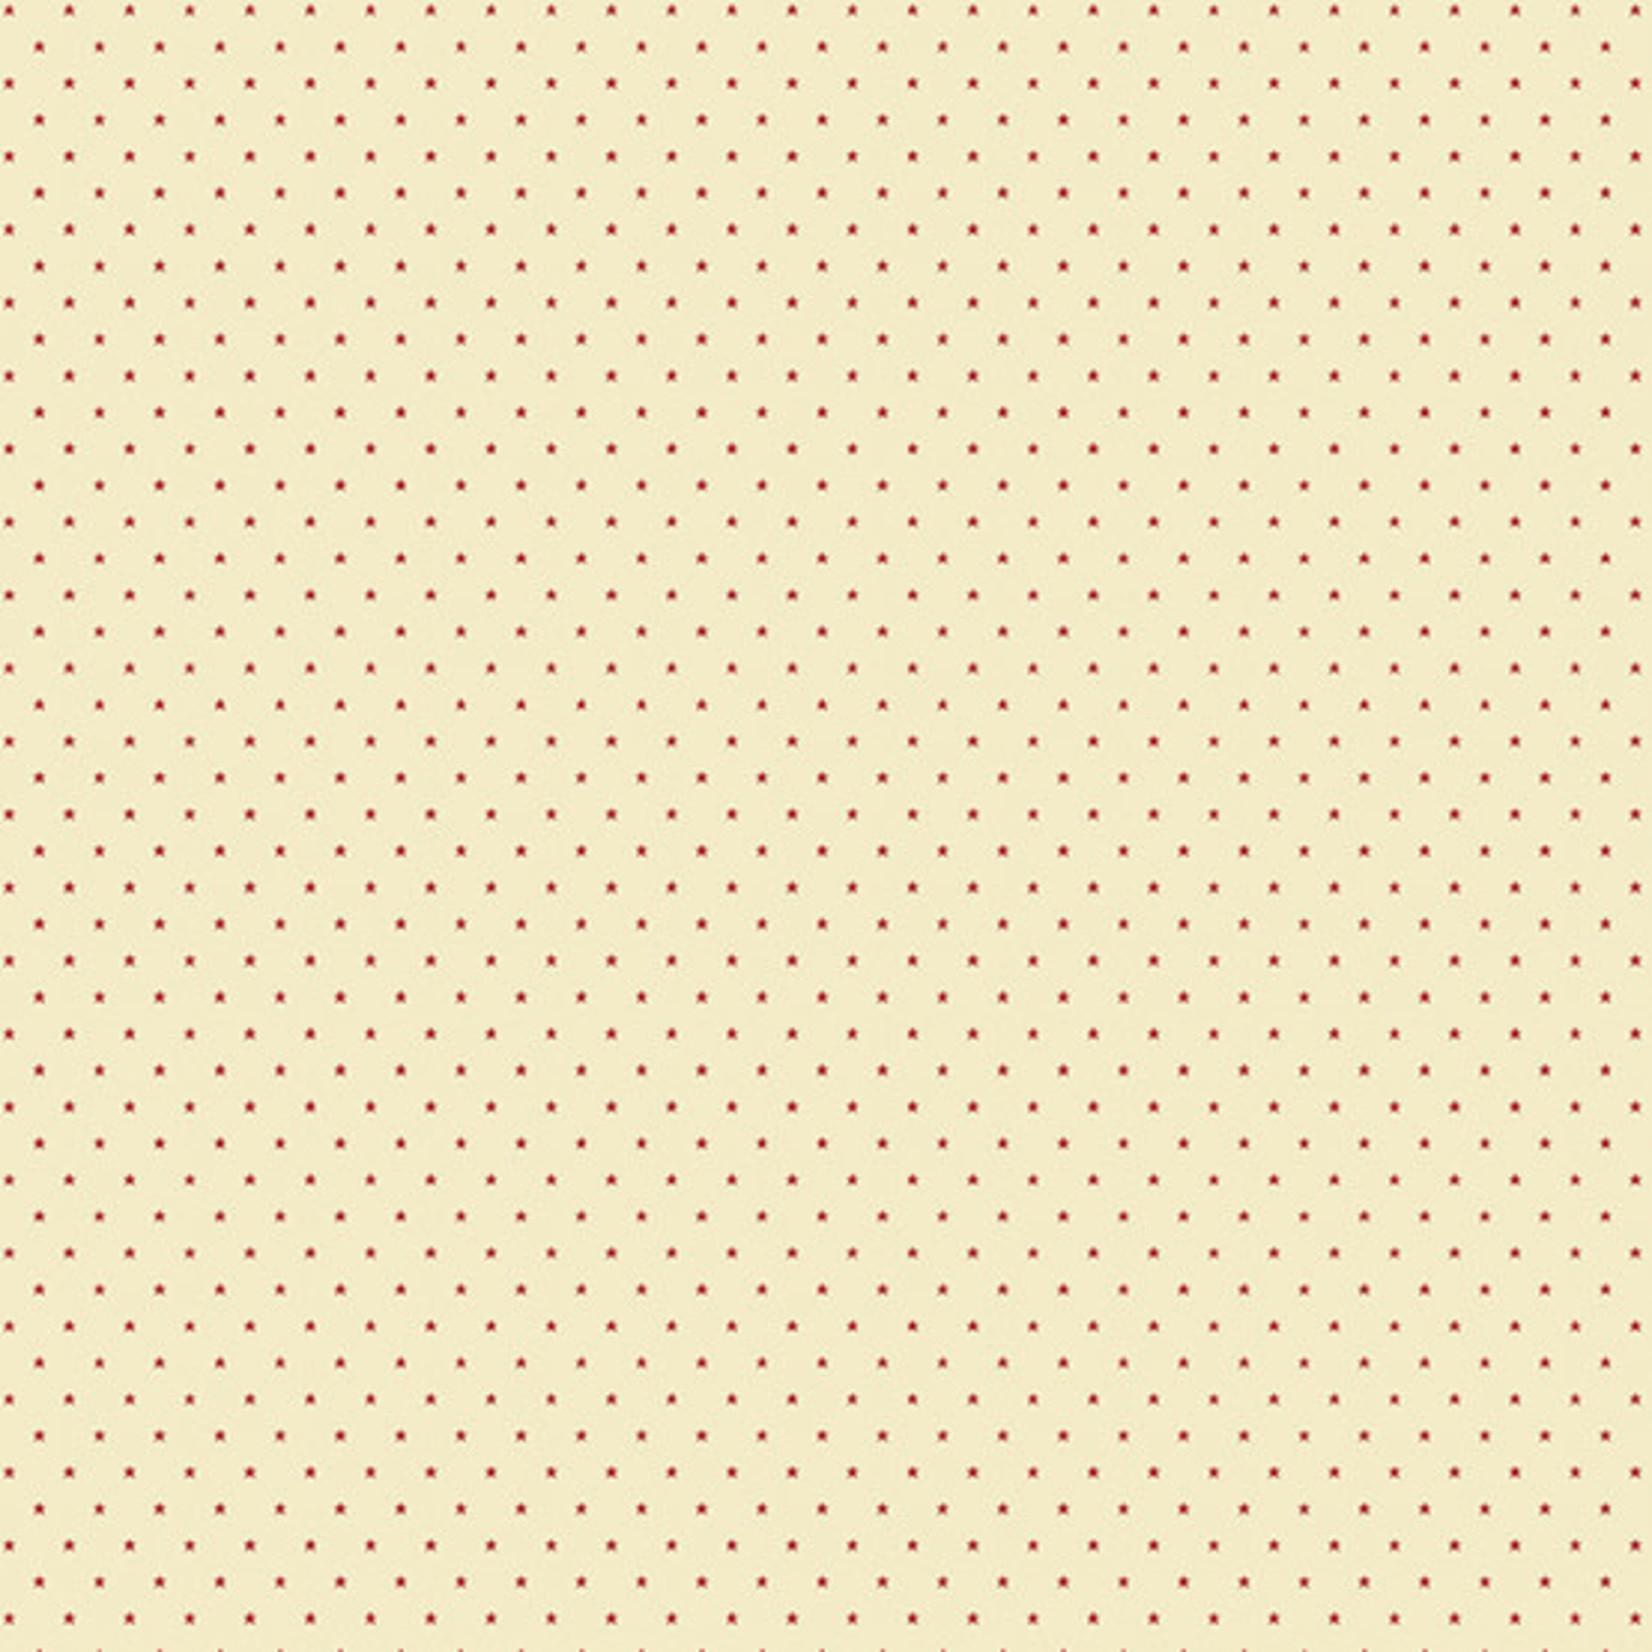 Edyta Sitar Secret Stash - Neutrals, Stars, Cream (8760-LR) $0.20 per cm or $20/m